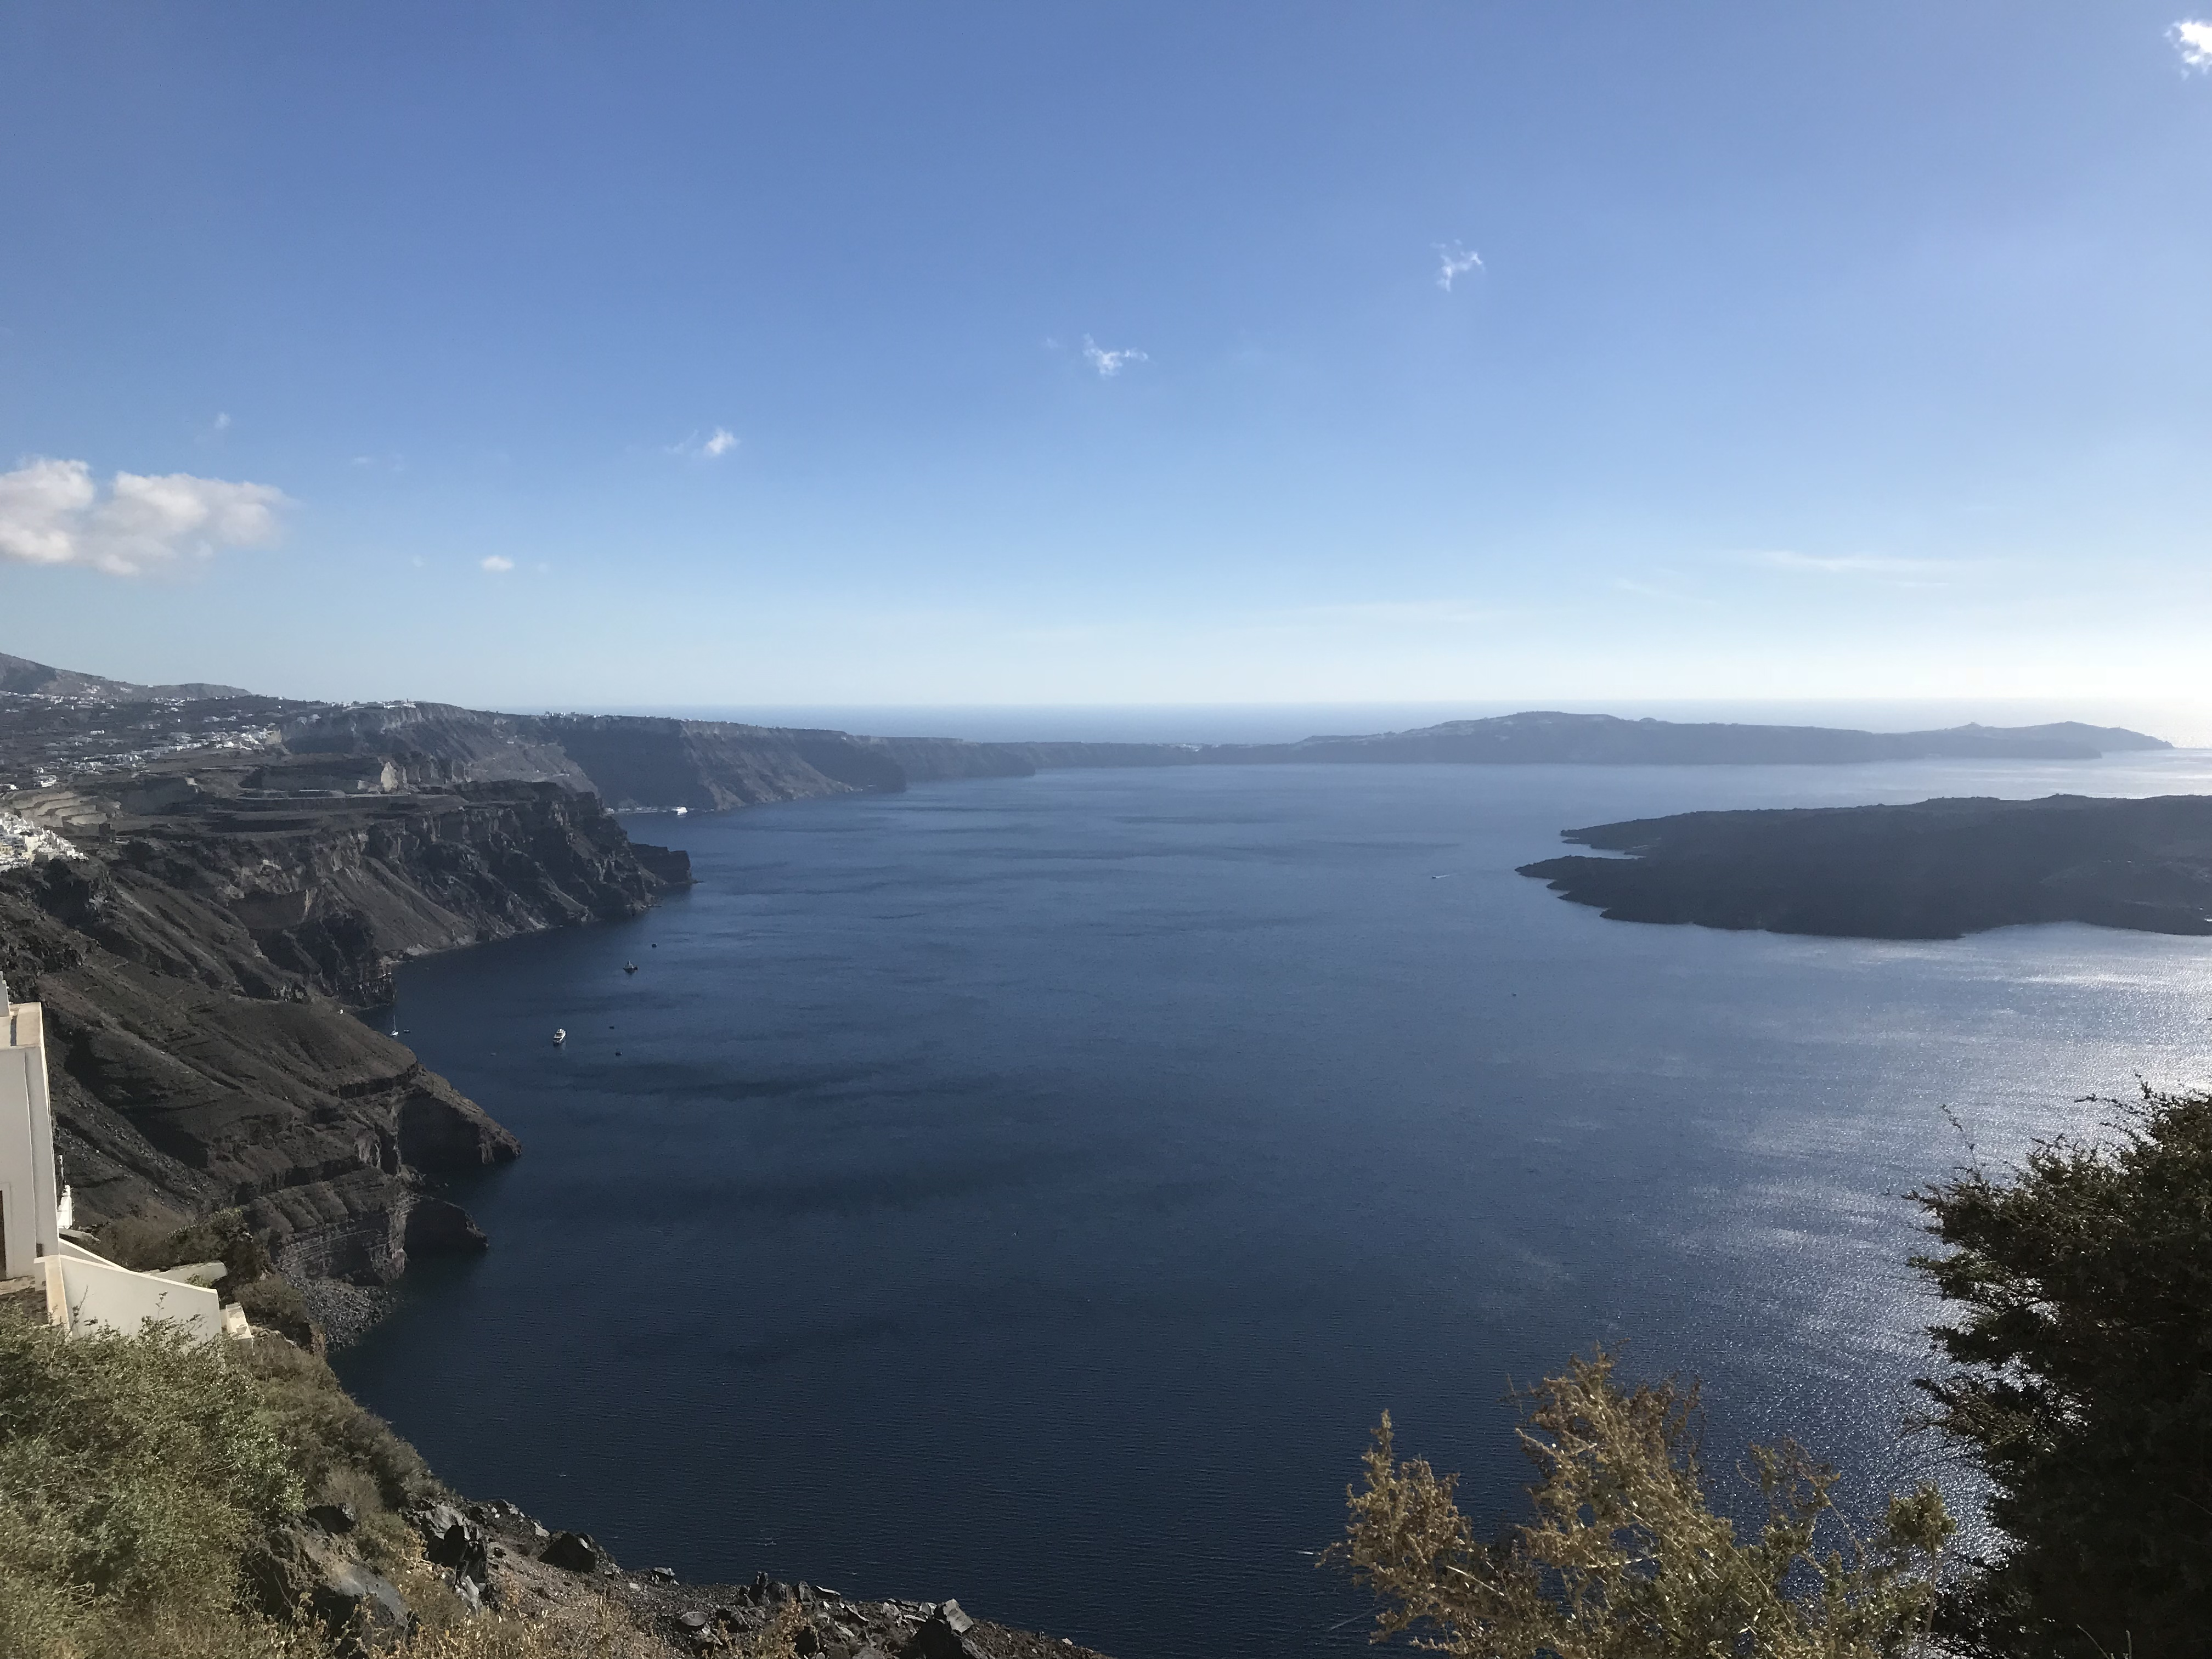 History of Santorini Greece